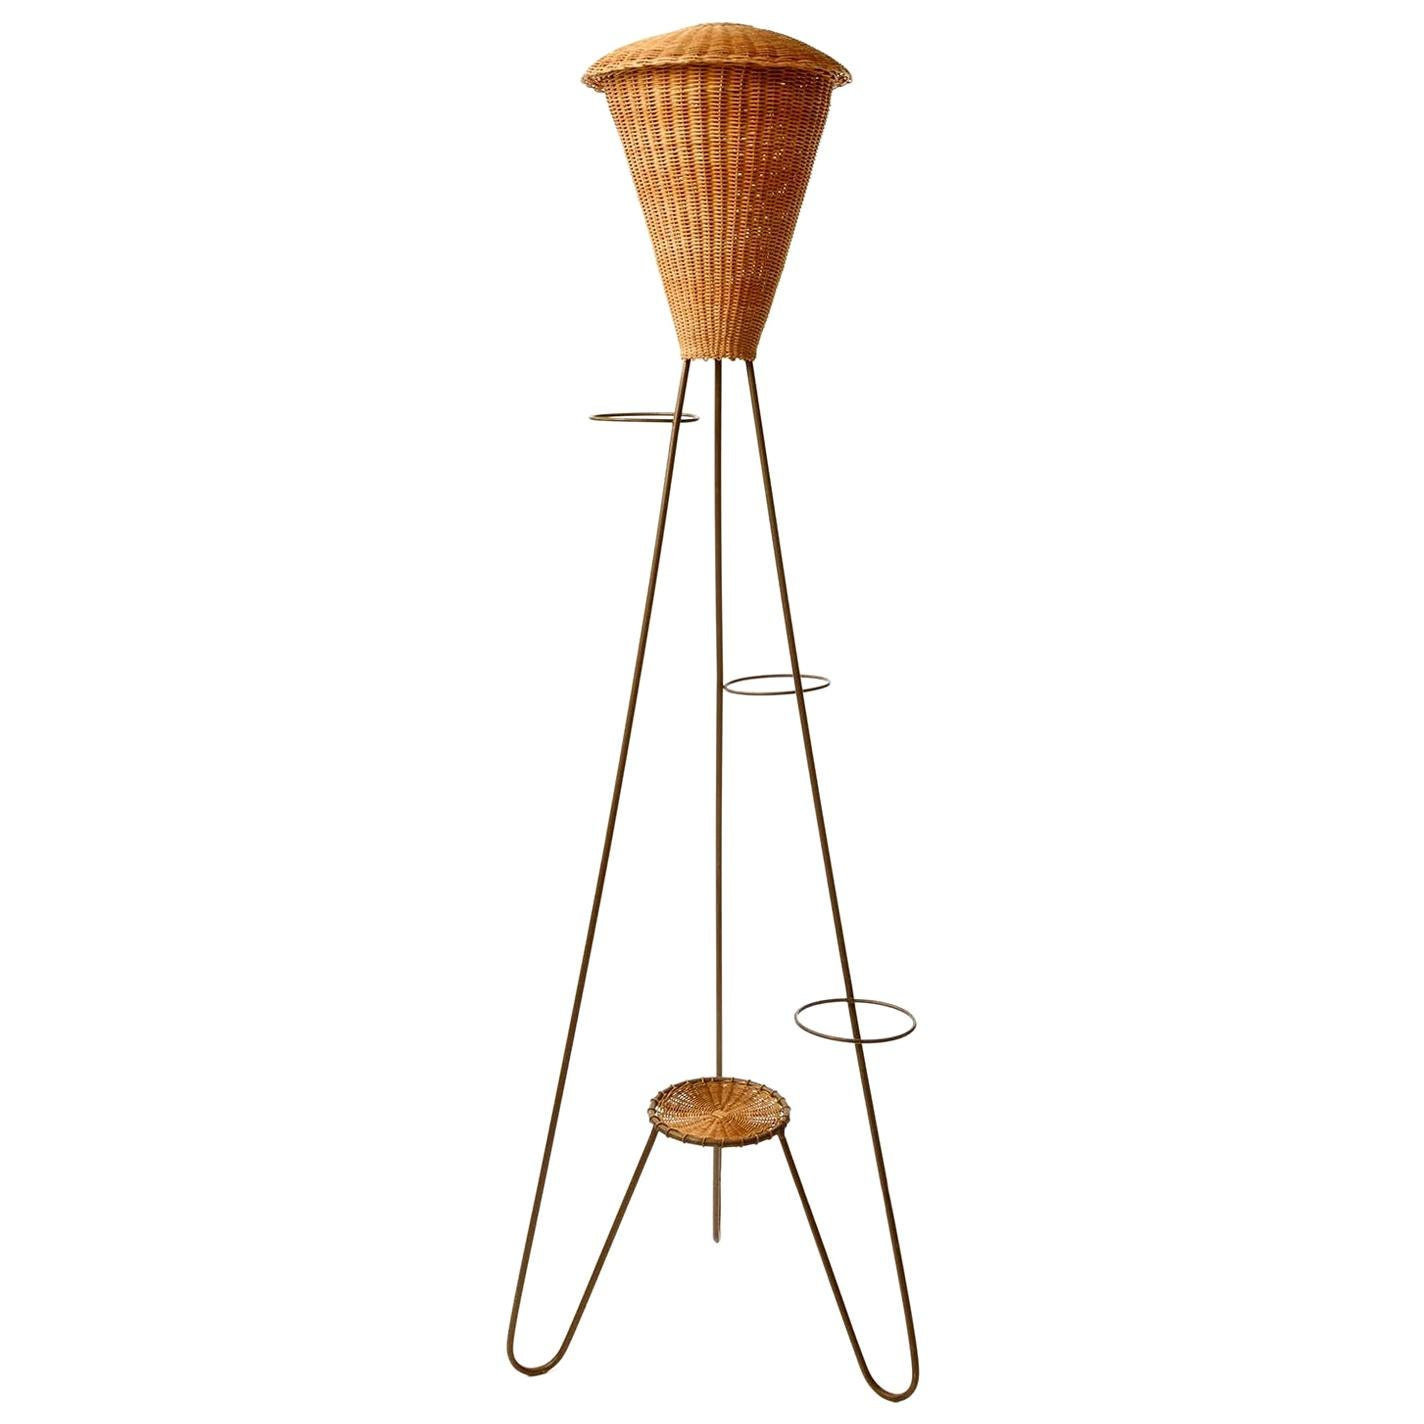 Floor Lamp Flower Stand, Patinated Brass Wicker Rattan, 1960